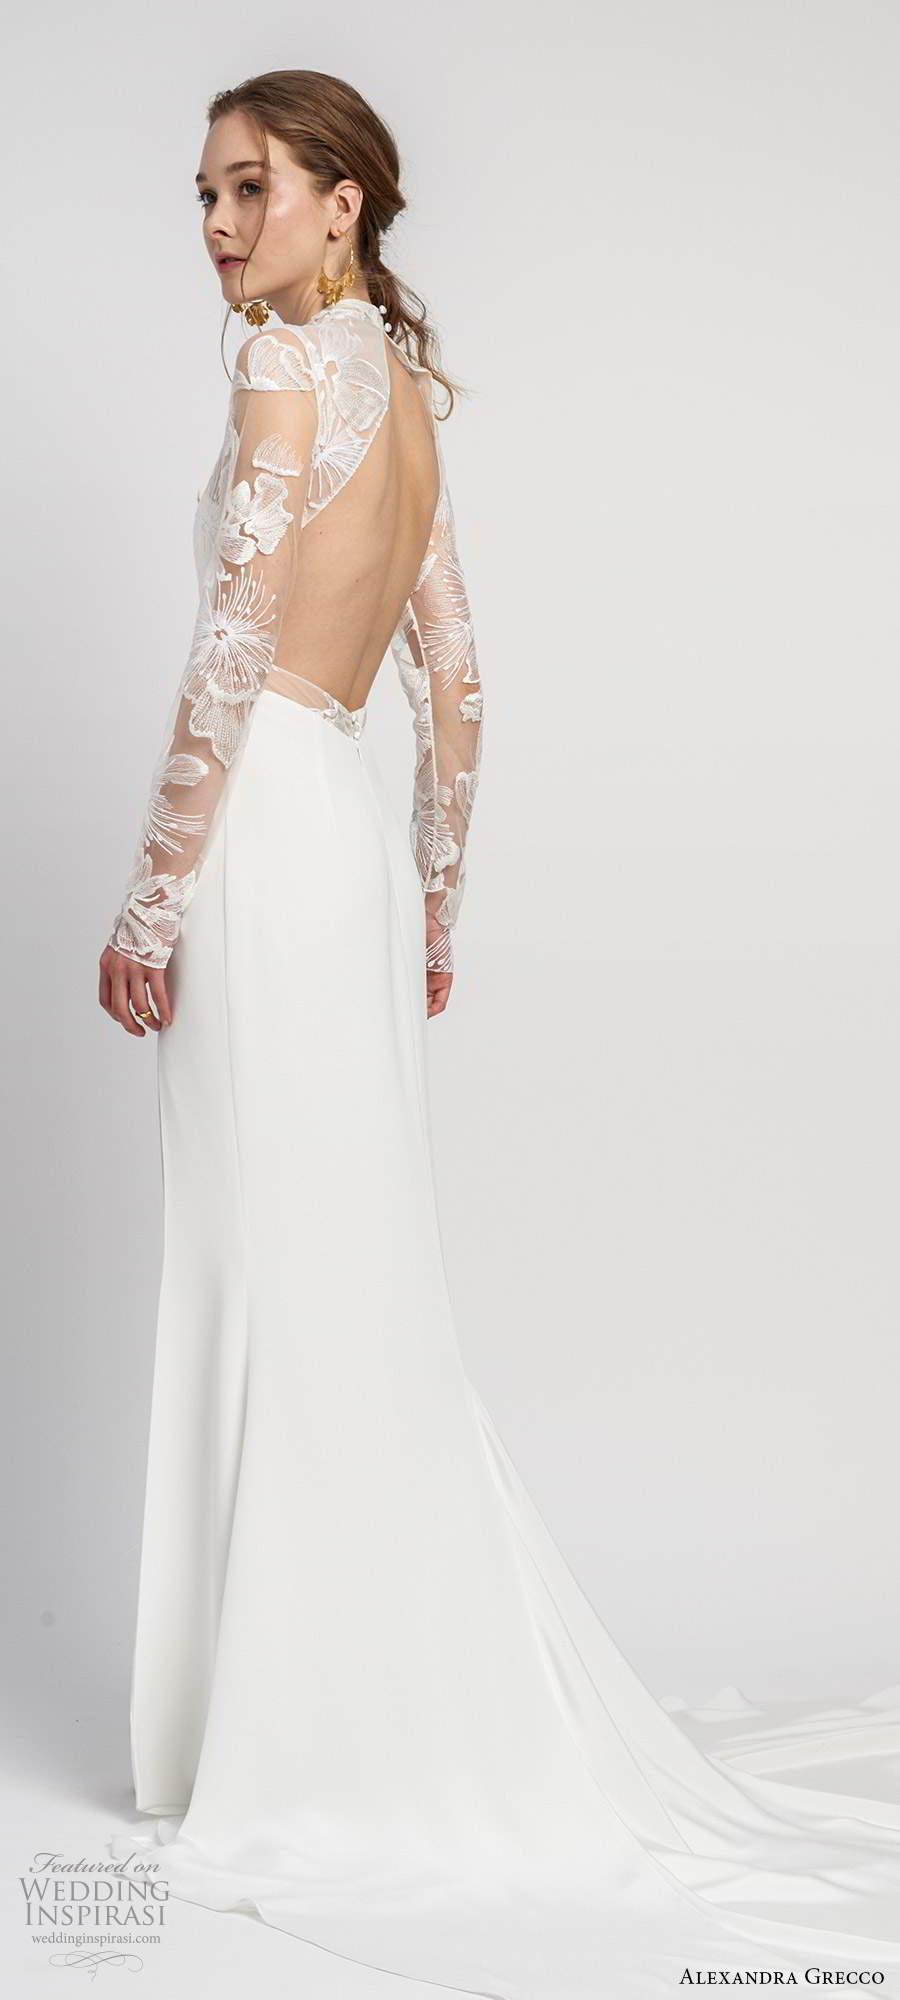 alexandra grecco 2020 bridal illusion long sleeves sheer high necklinge embellished lace bodice sheath wedding dress slit skirt cutout back cathedral train (4) bv